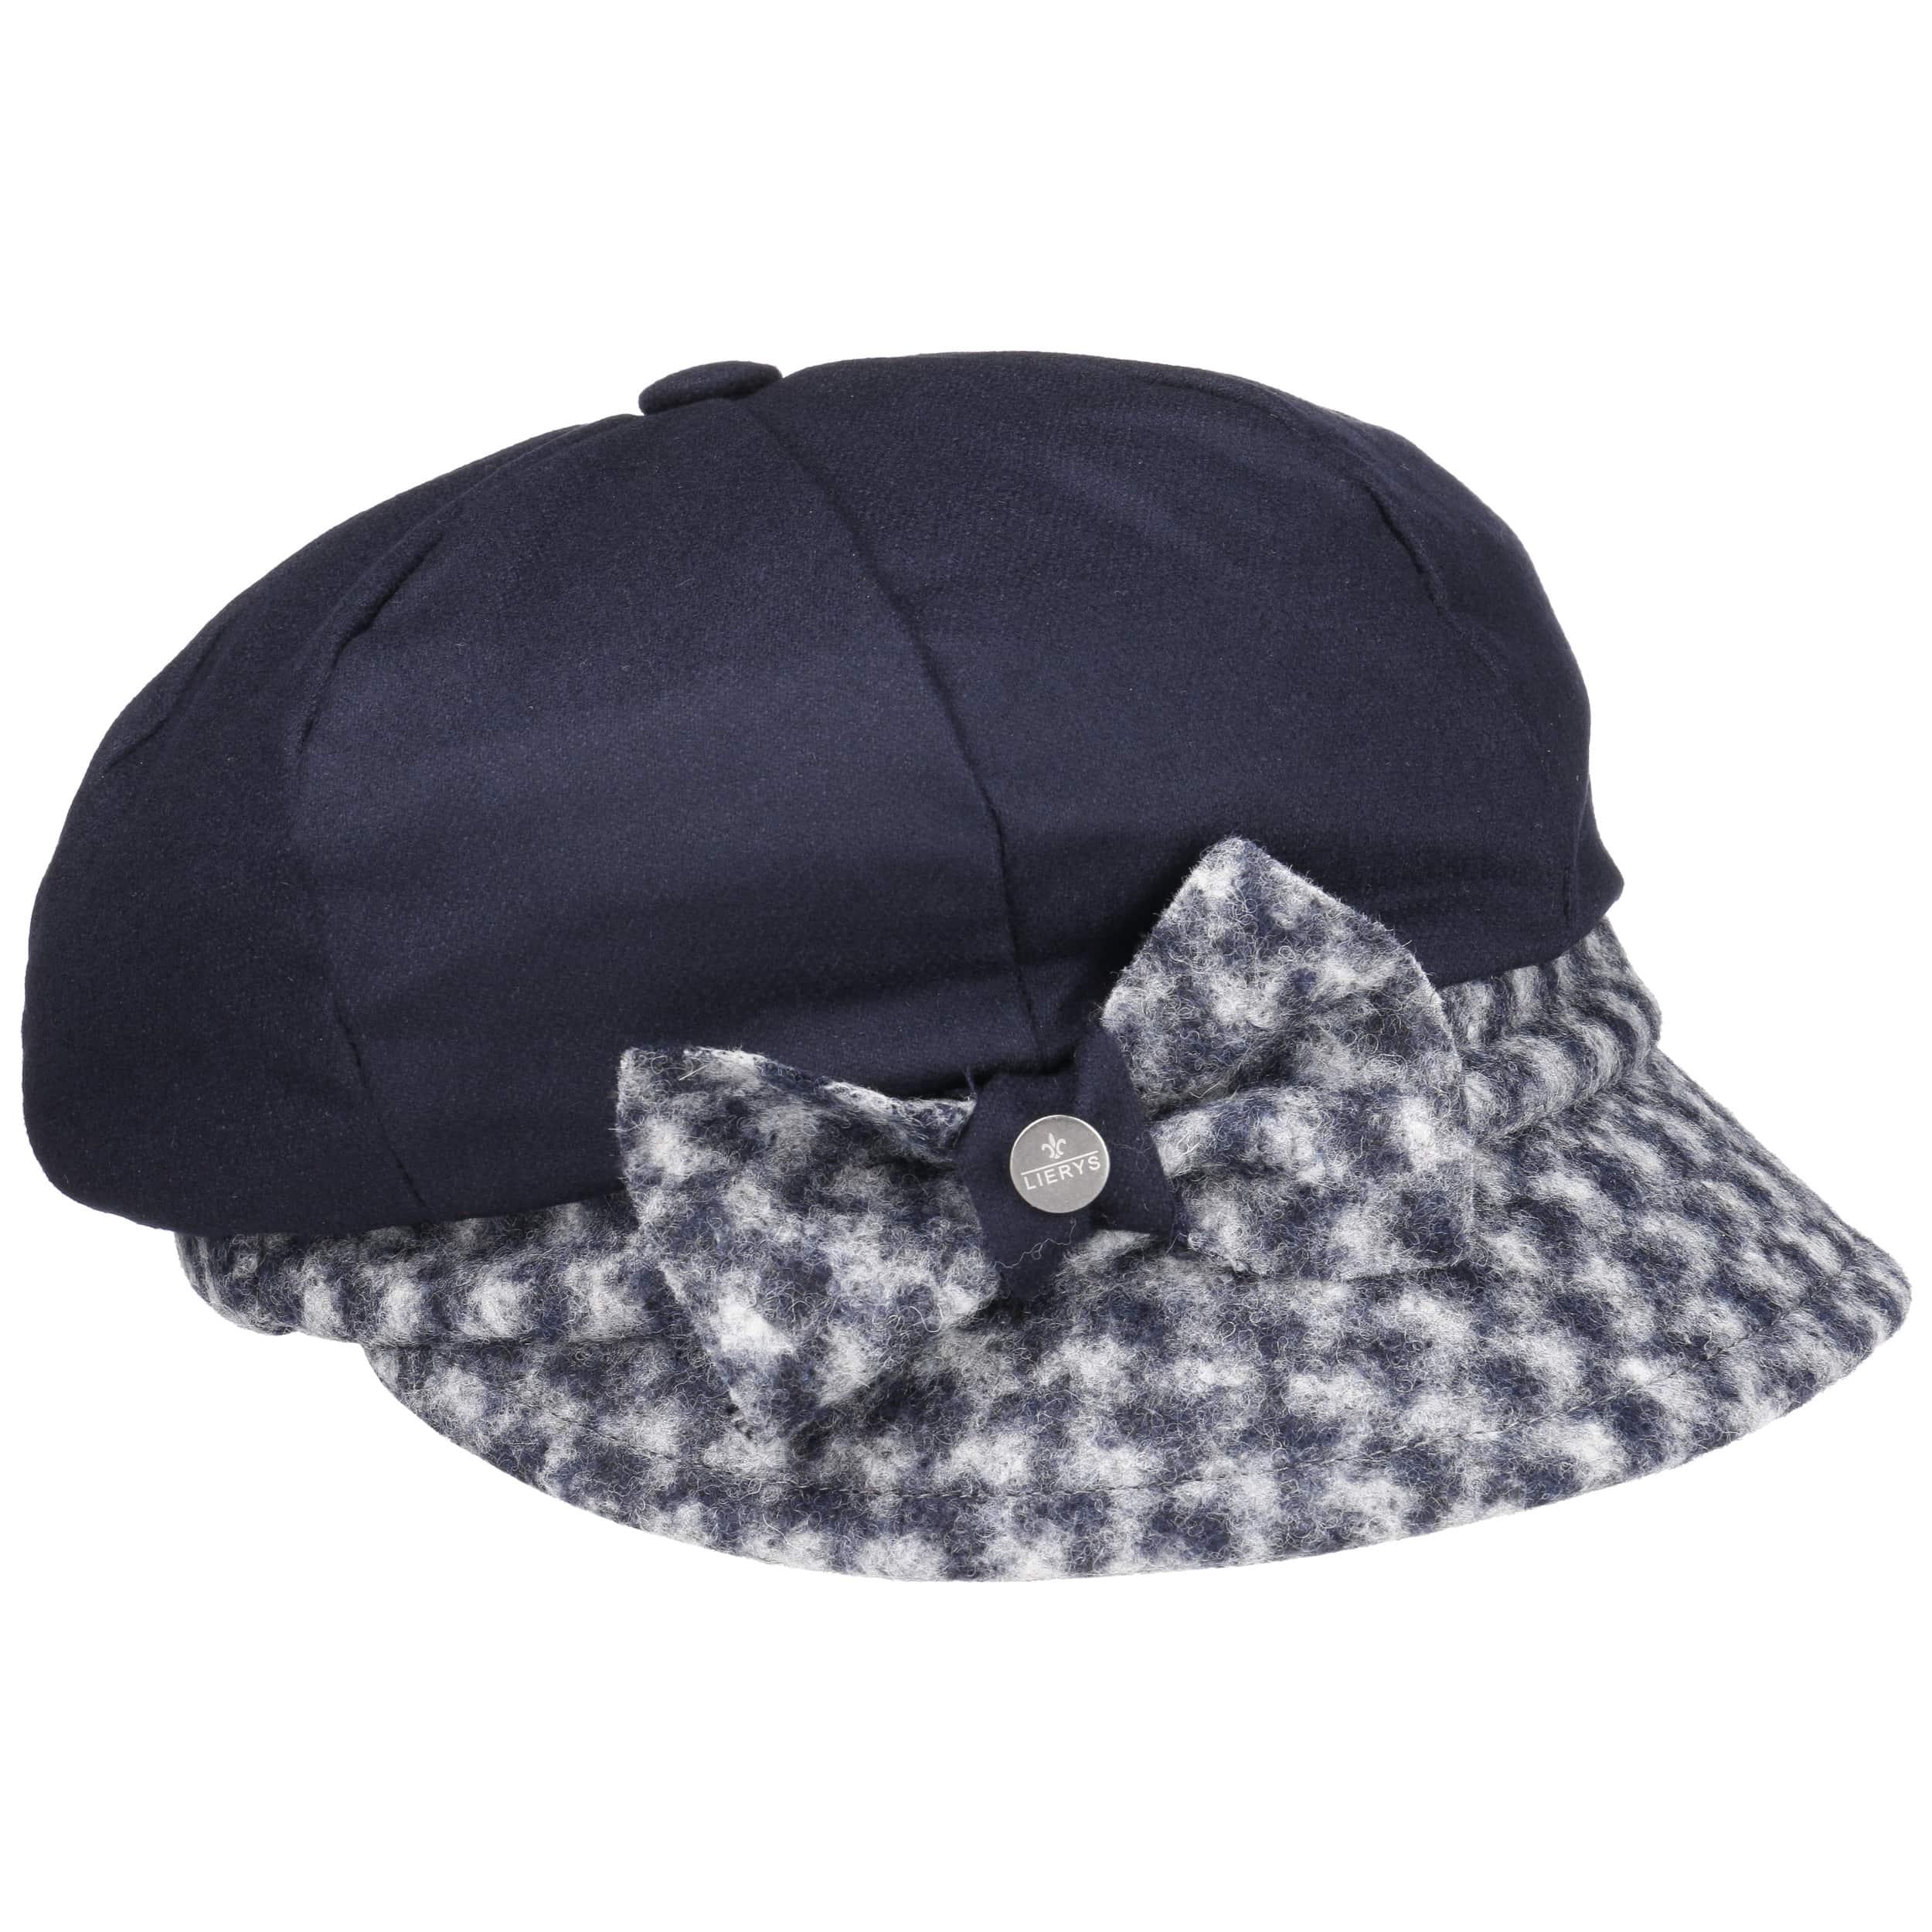 Walrus Hats Wool Blend 8 Panel Newsboy Cap Shelby